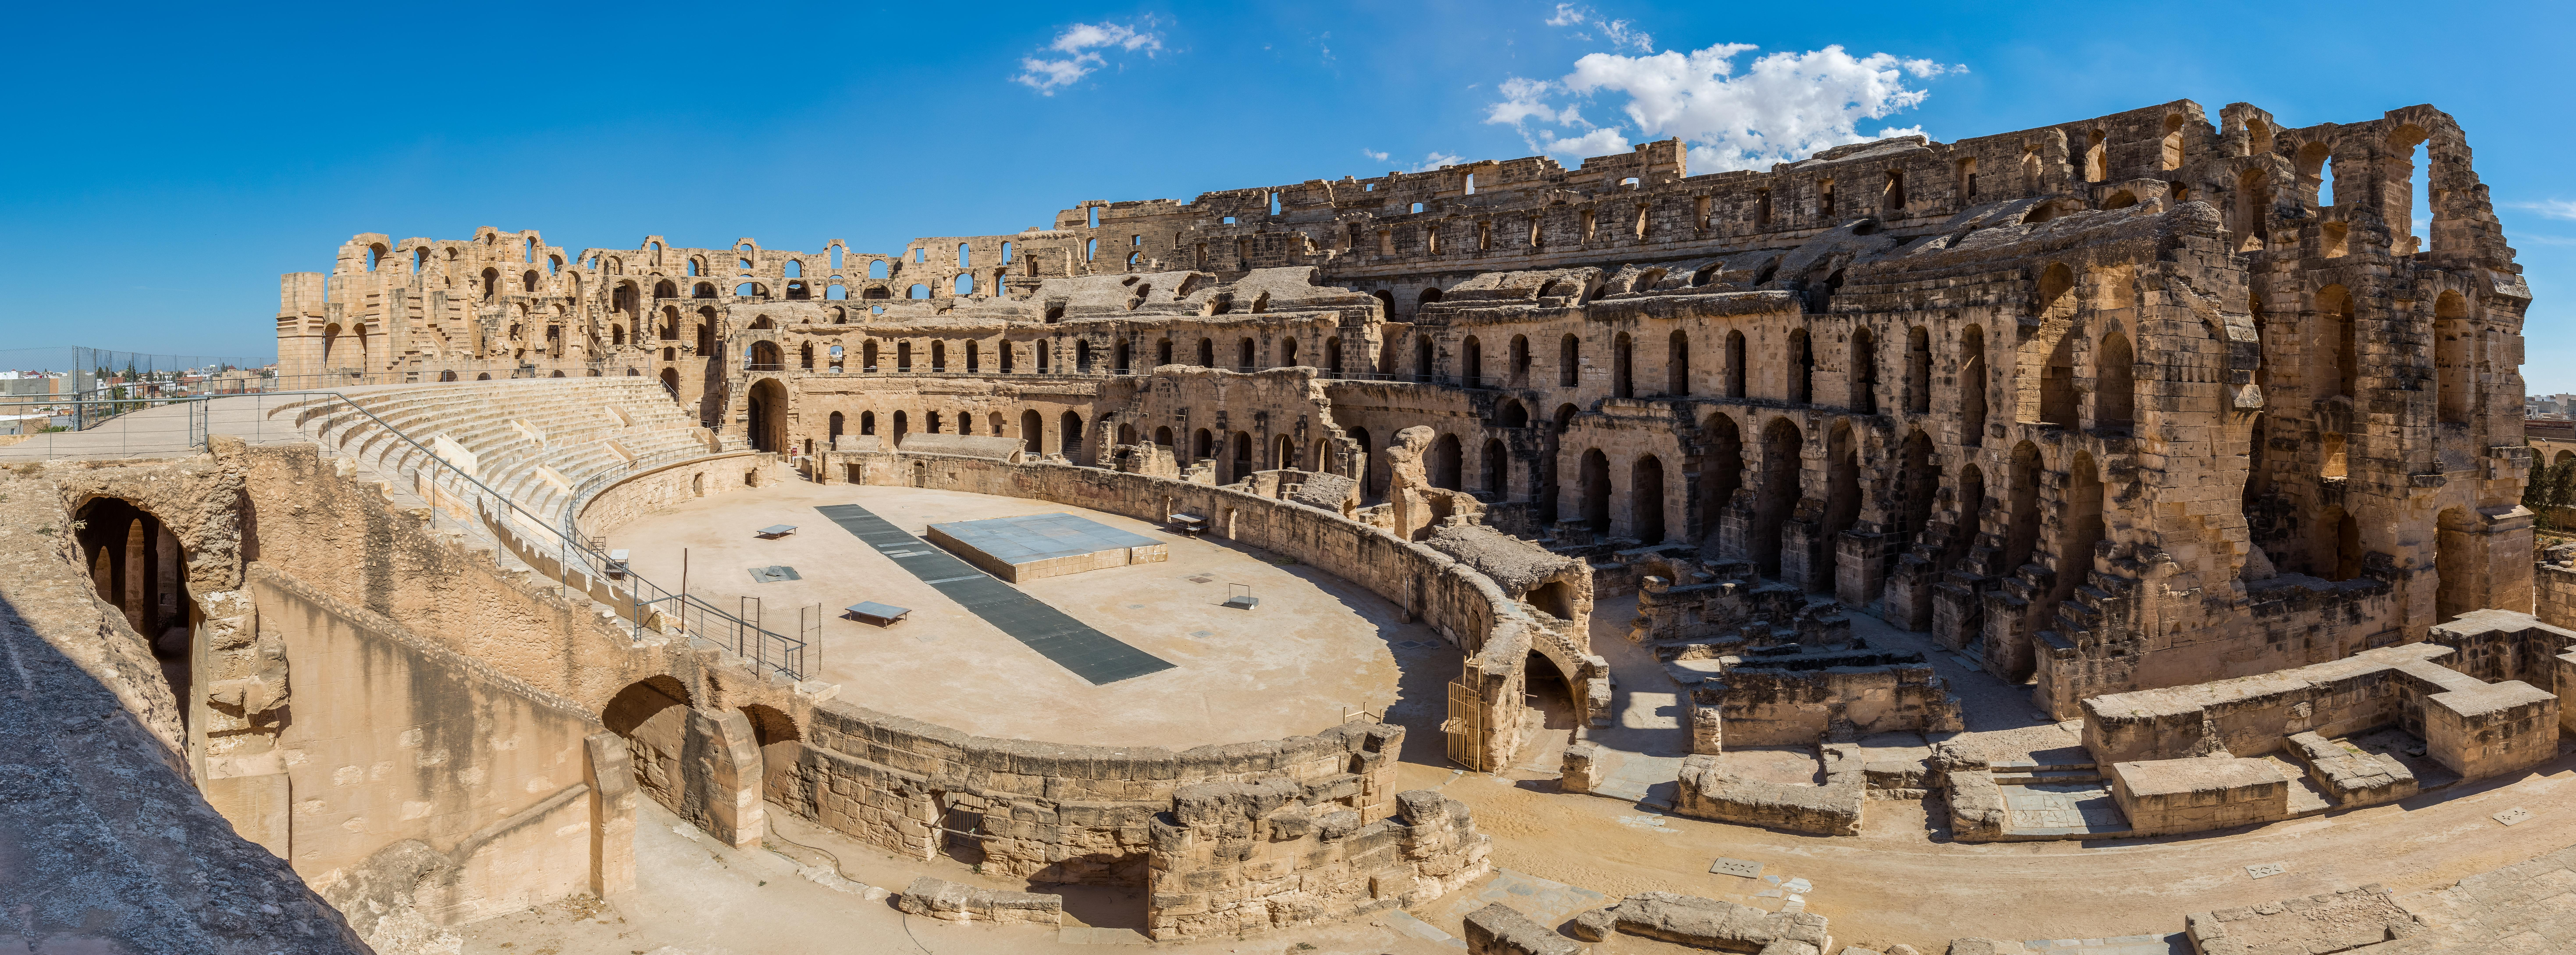 Amphitheatre of El Jem - Wikipedia